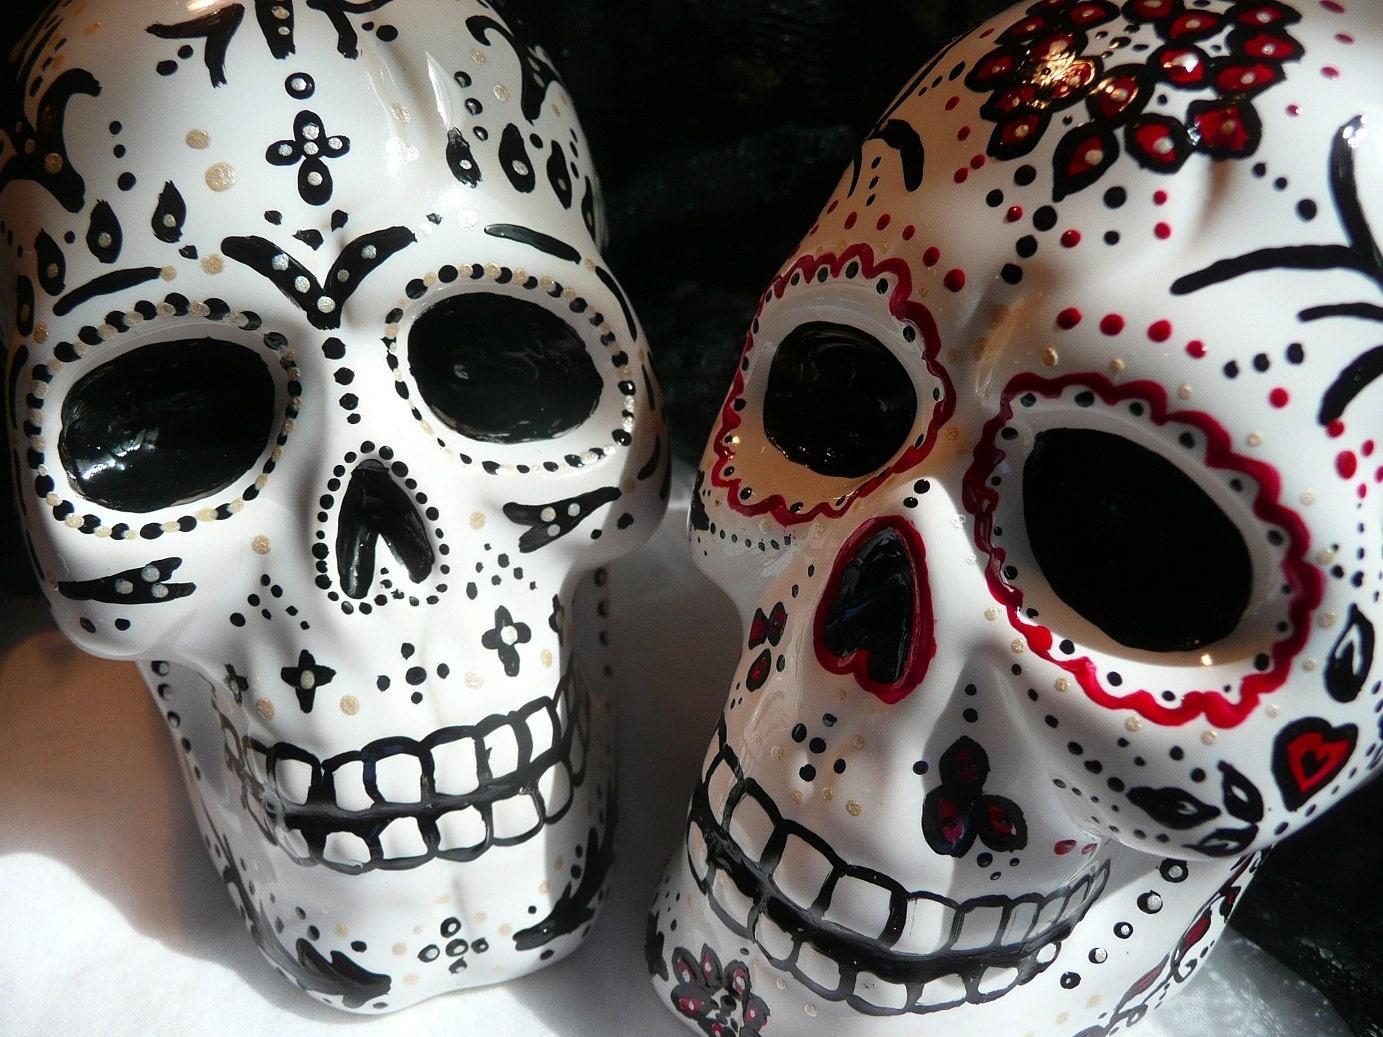 day of the dead gothic skull cake topper lrg red black